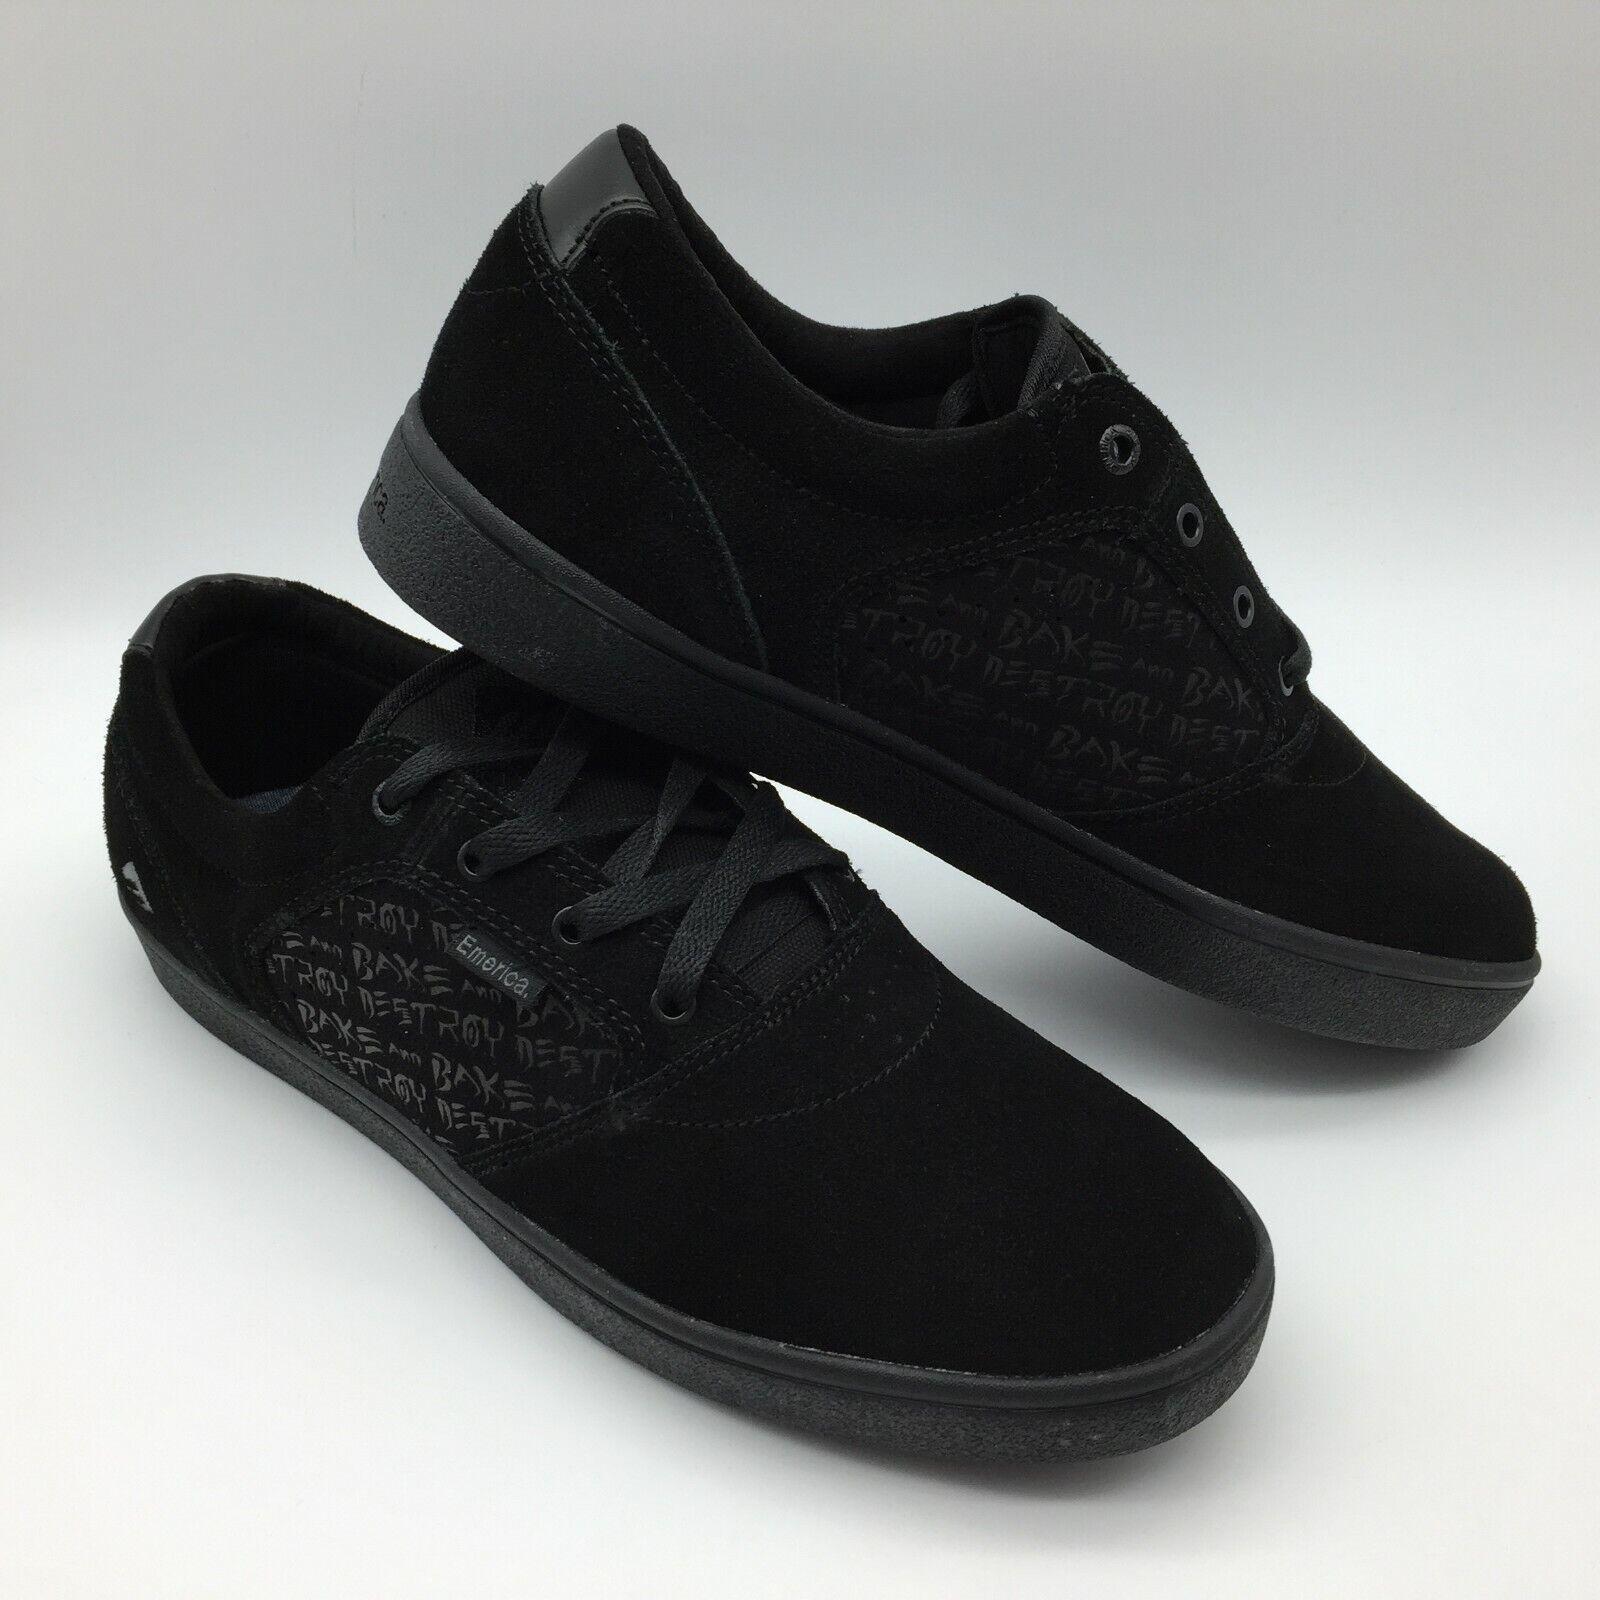 Emerica men women shoes   Figgy Dosaggio x Baker   black black